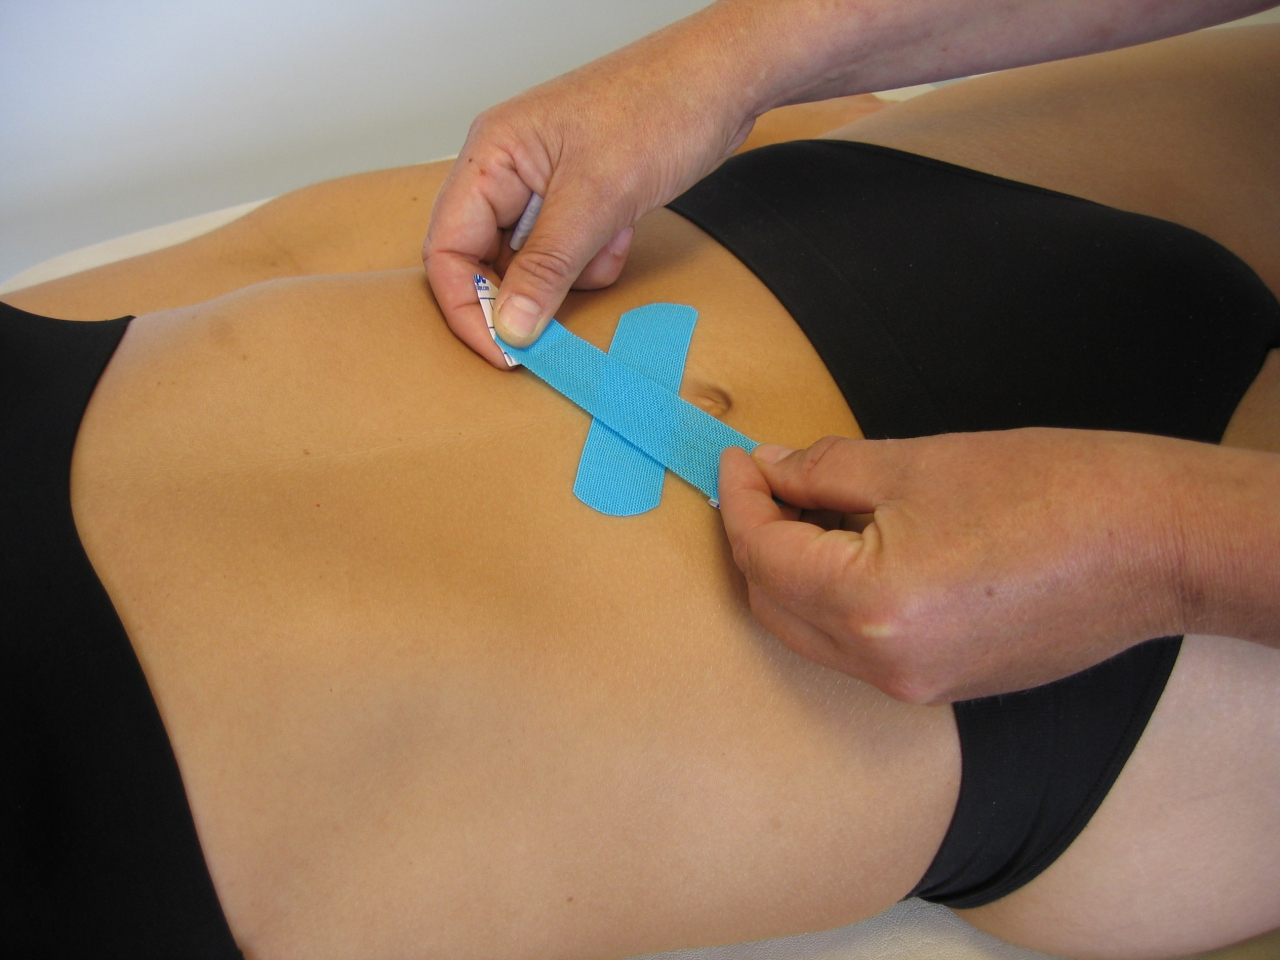 лечение диастаза, схема тейпирования